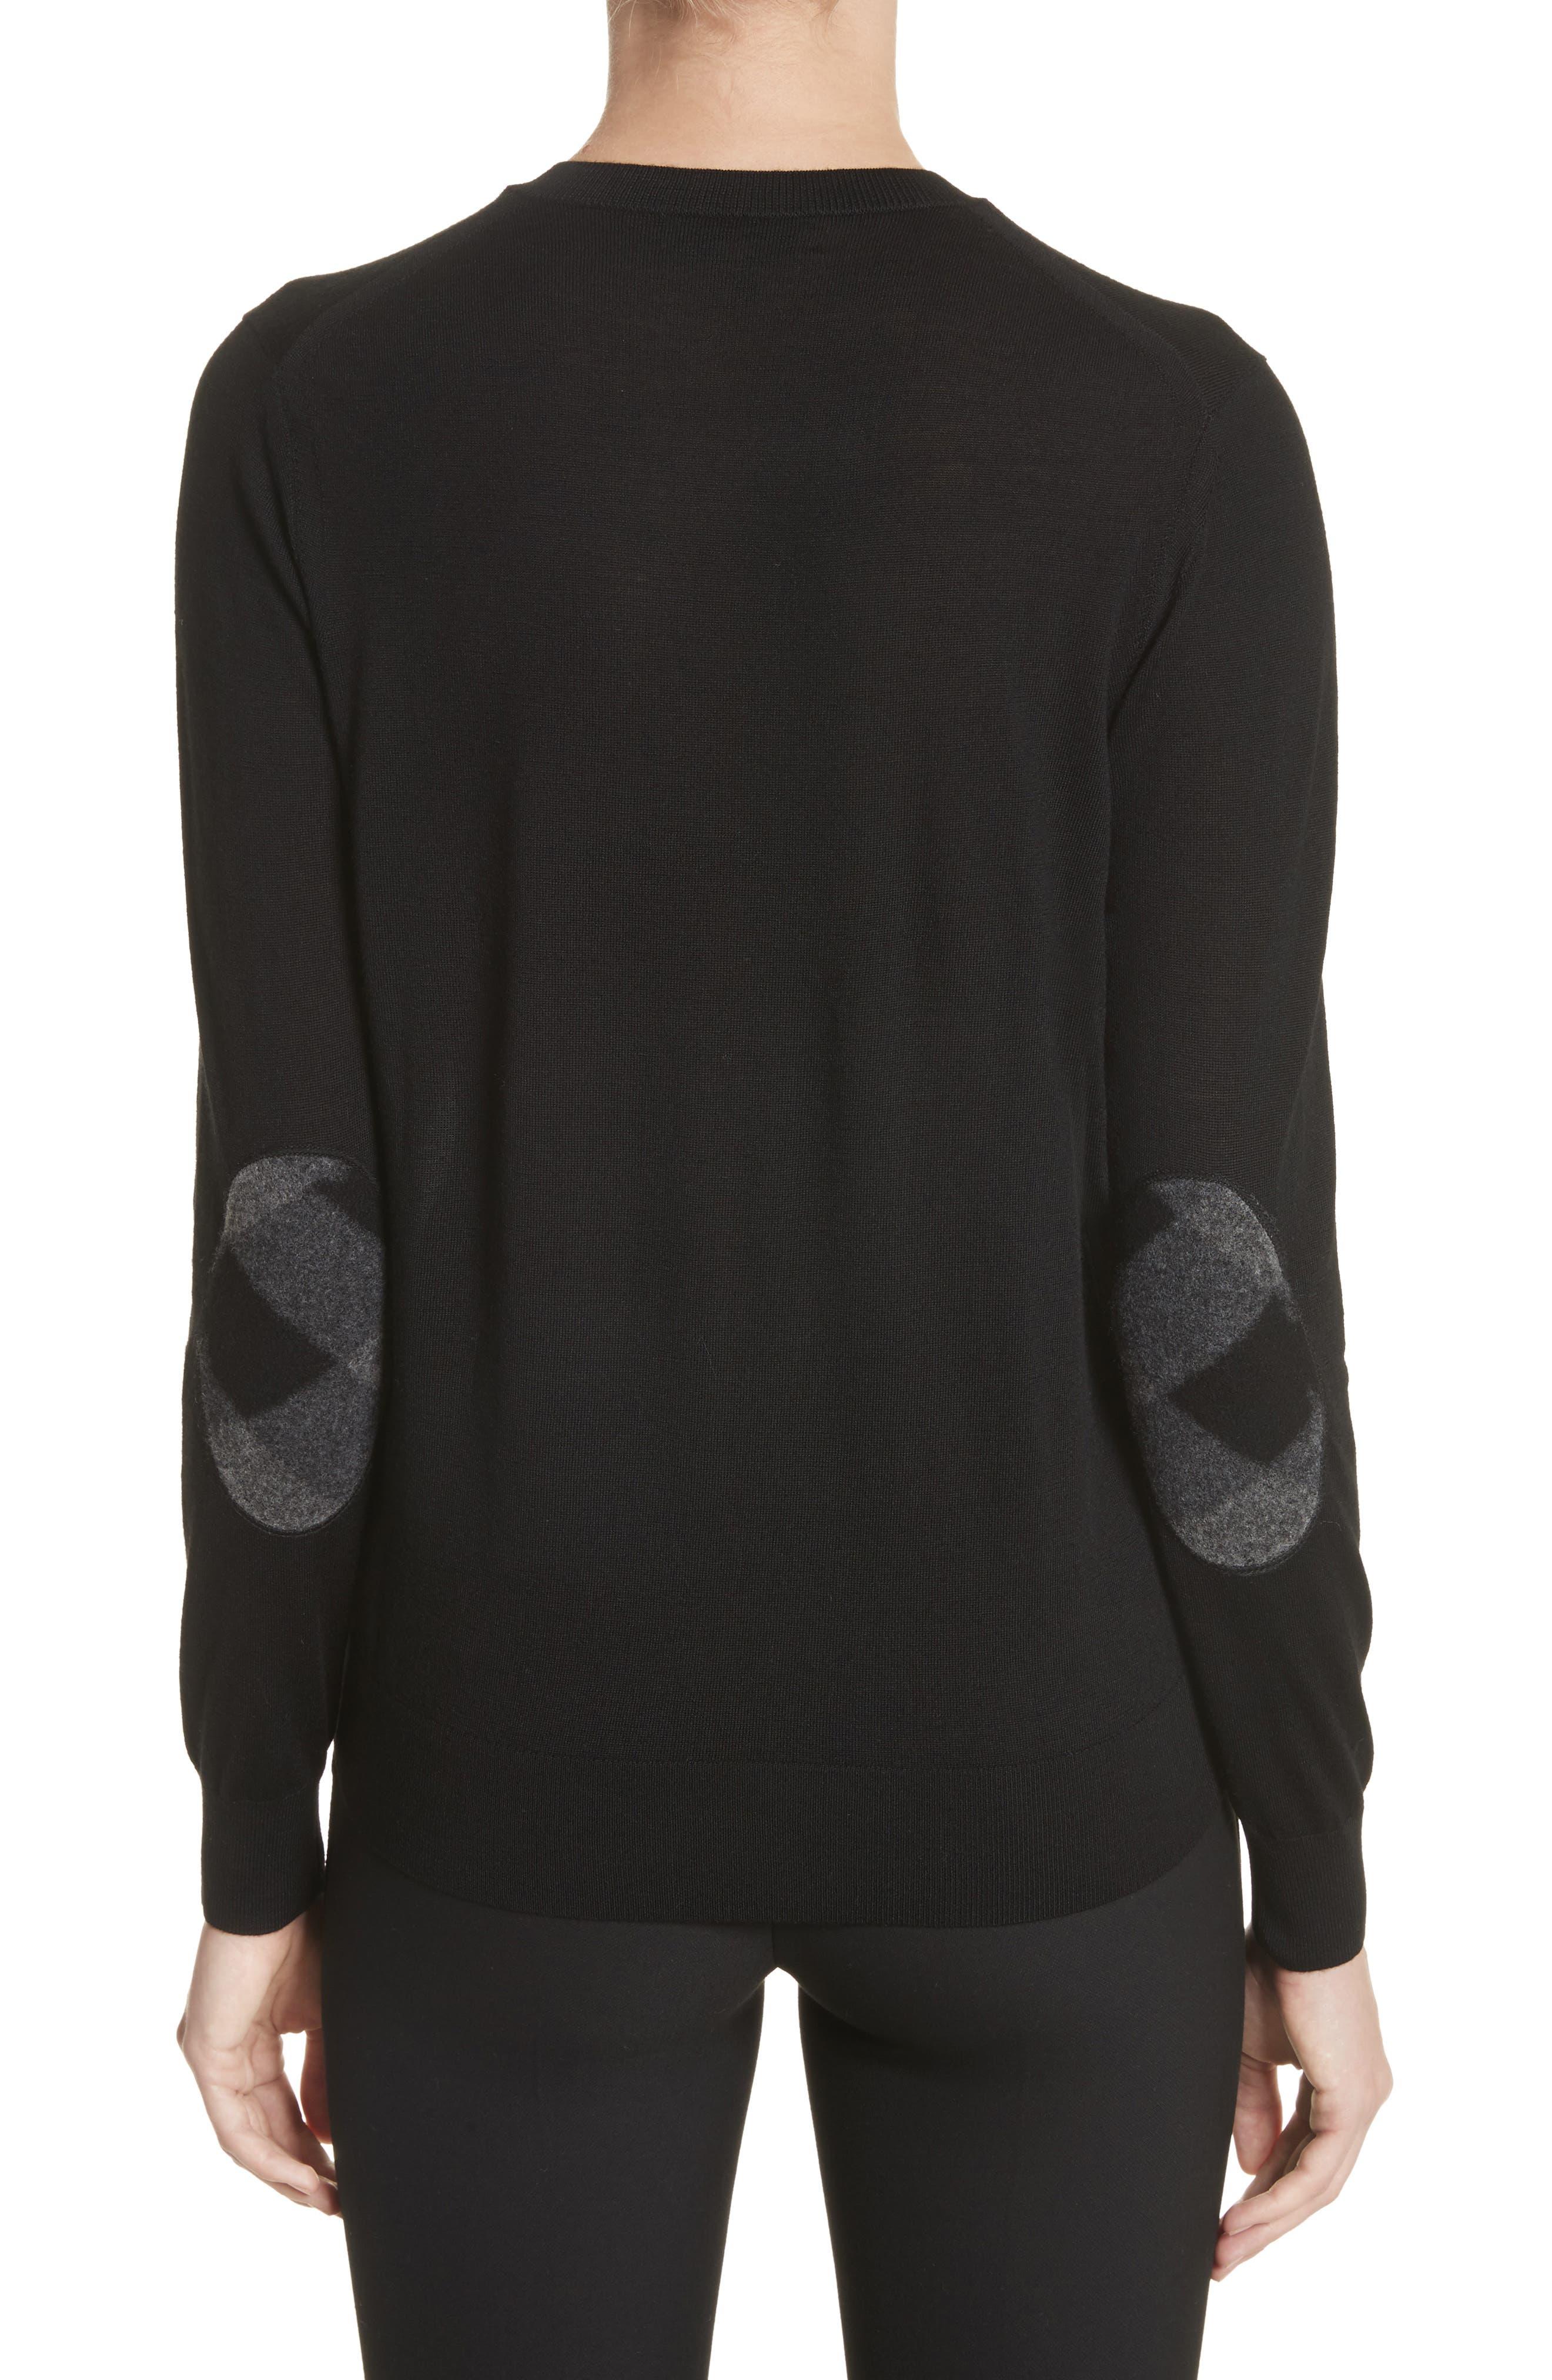 BURBERRY,                             Viar Merino Wool Sweater,                             Alternate thumbnail 2, color,                             001